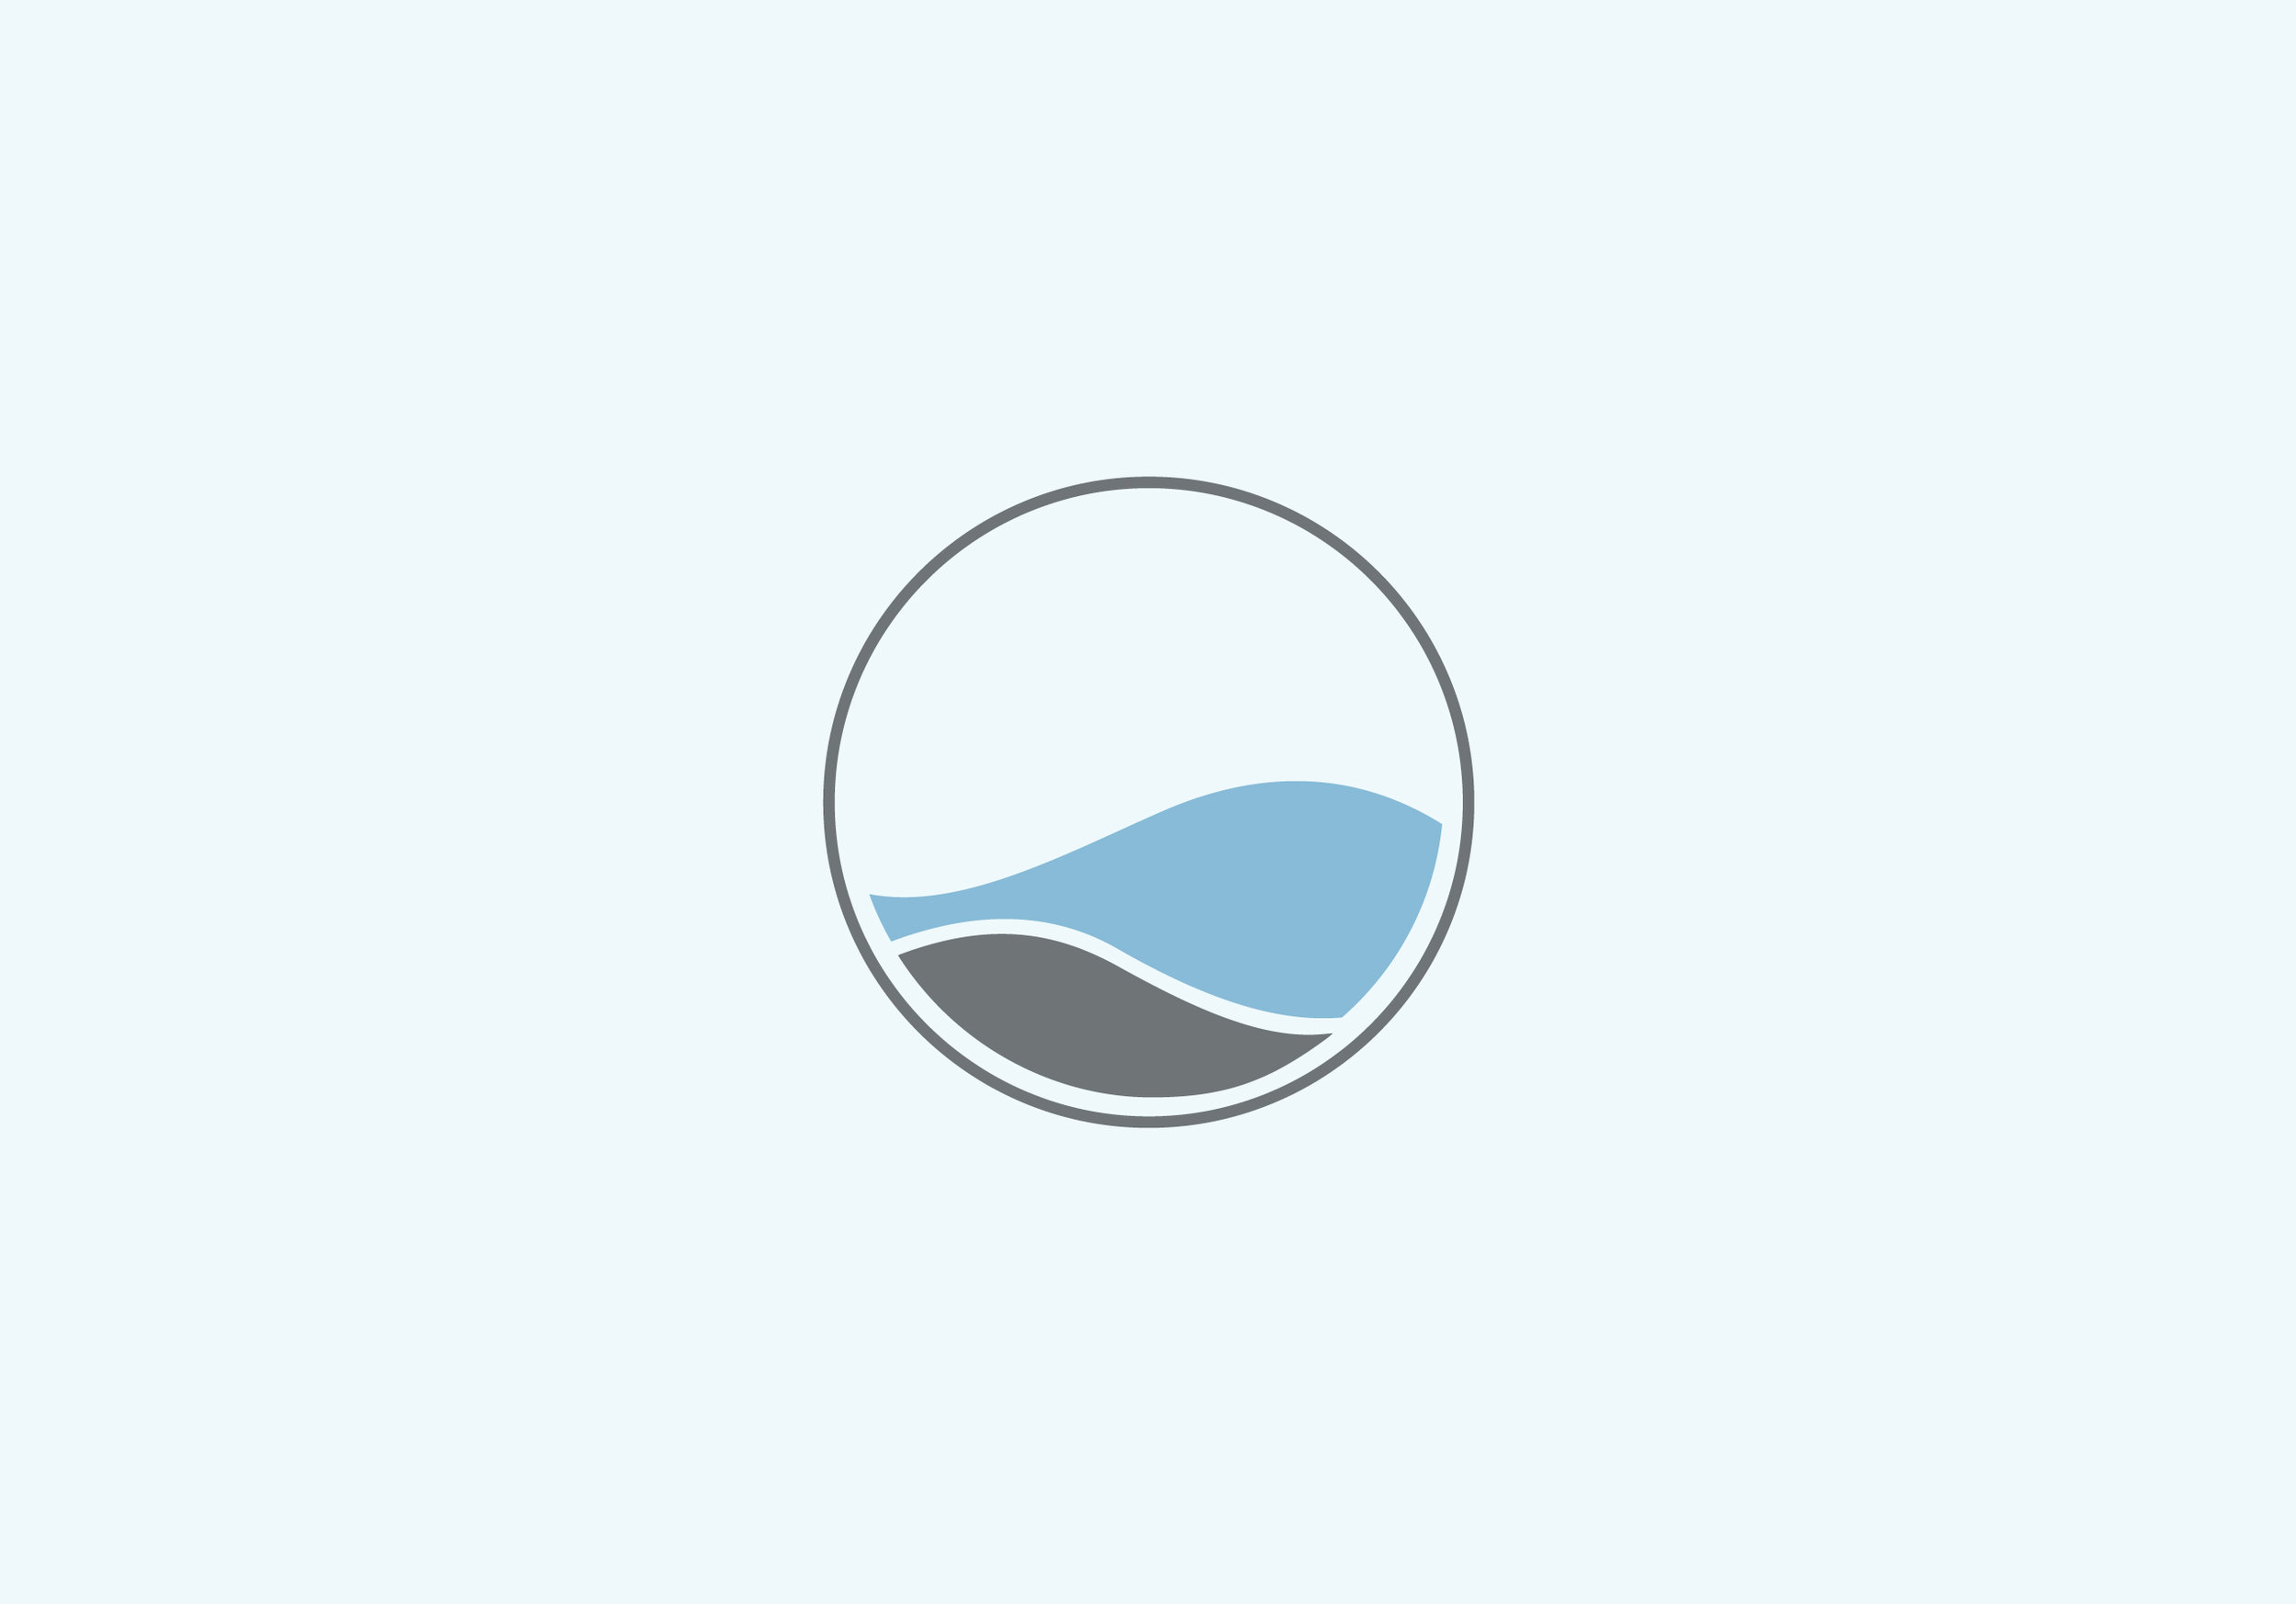 conejo-valley-logo-3.jpg